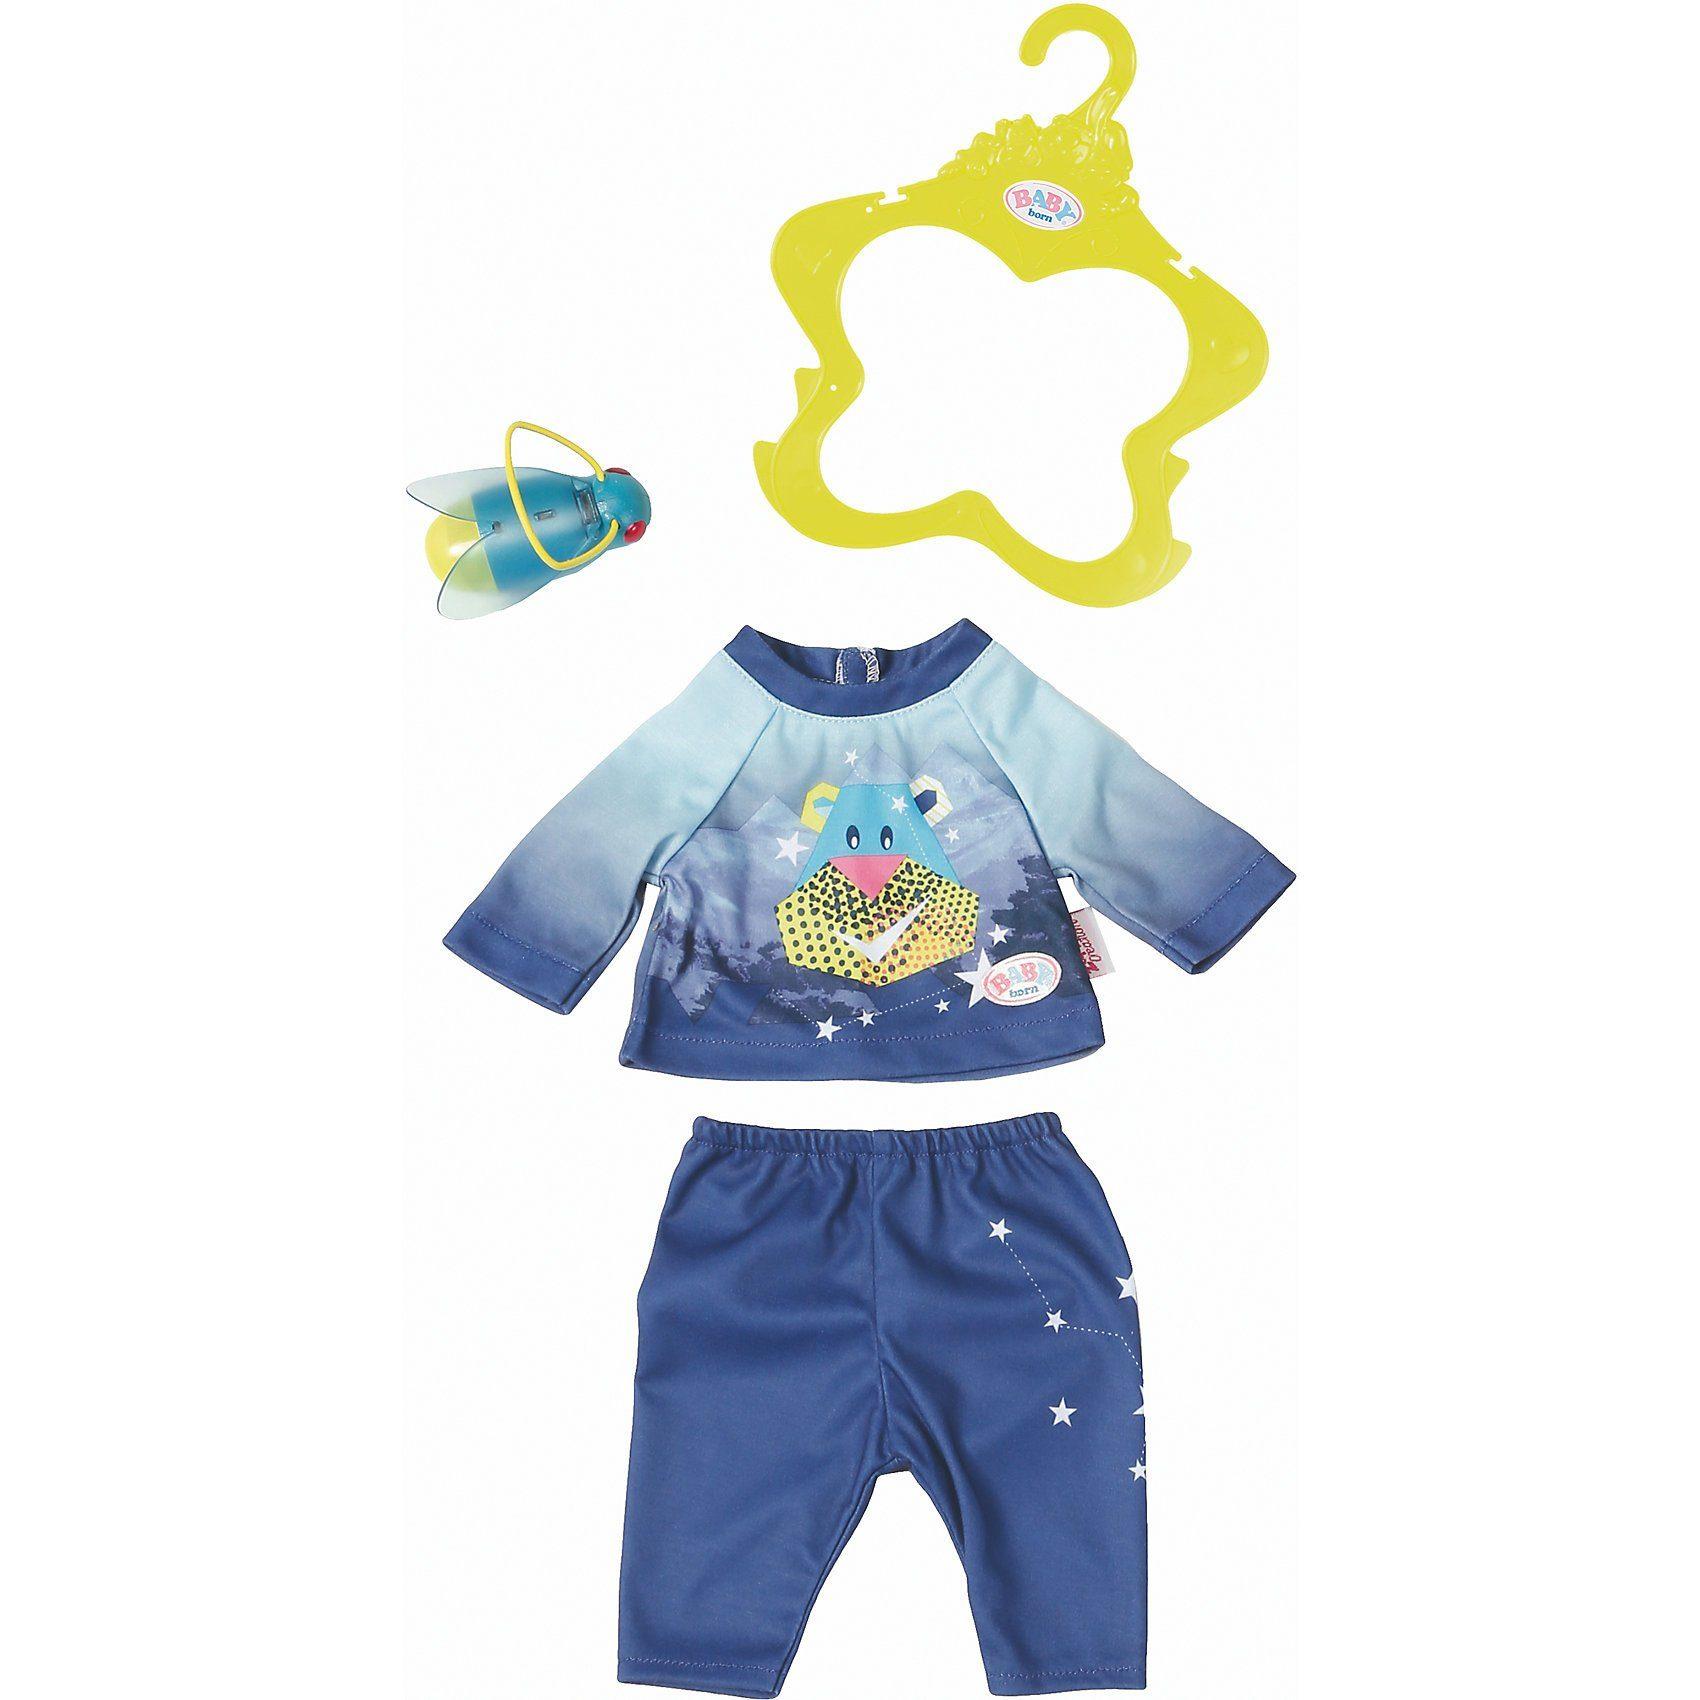 Zapf Creation® BABY born® Play&Fun Nachtlicht Outfit blue Puppenkleidung